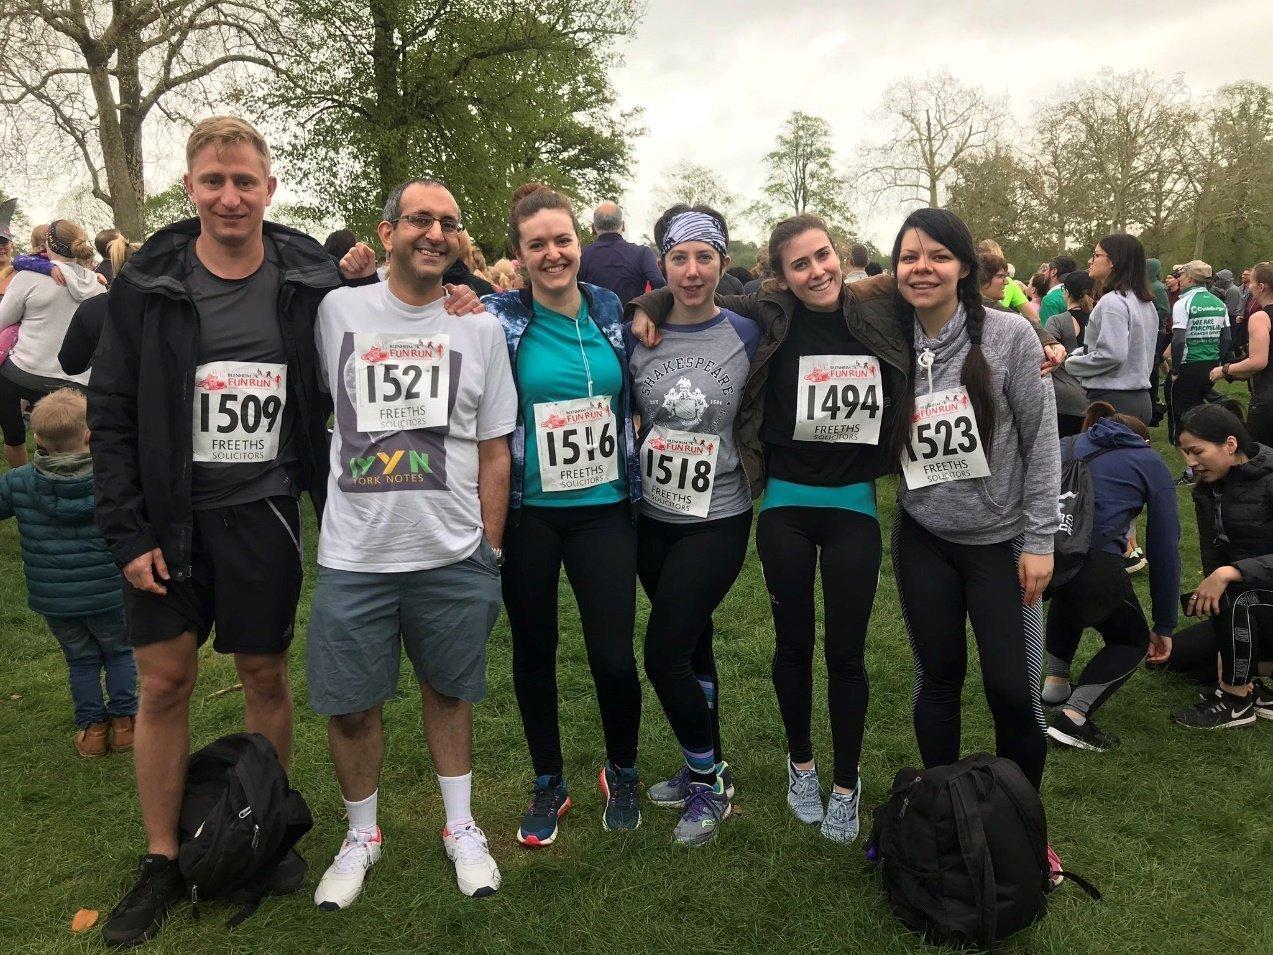 Blenheim 7k Fun Run. Team Blackwells in 2019